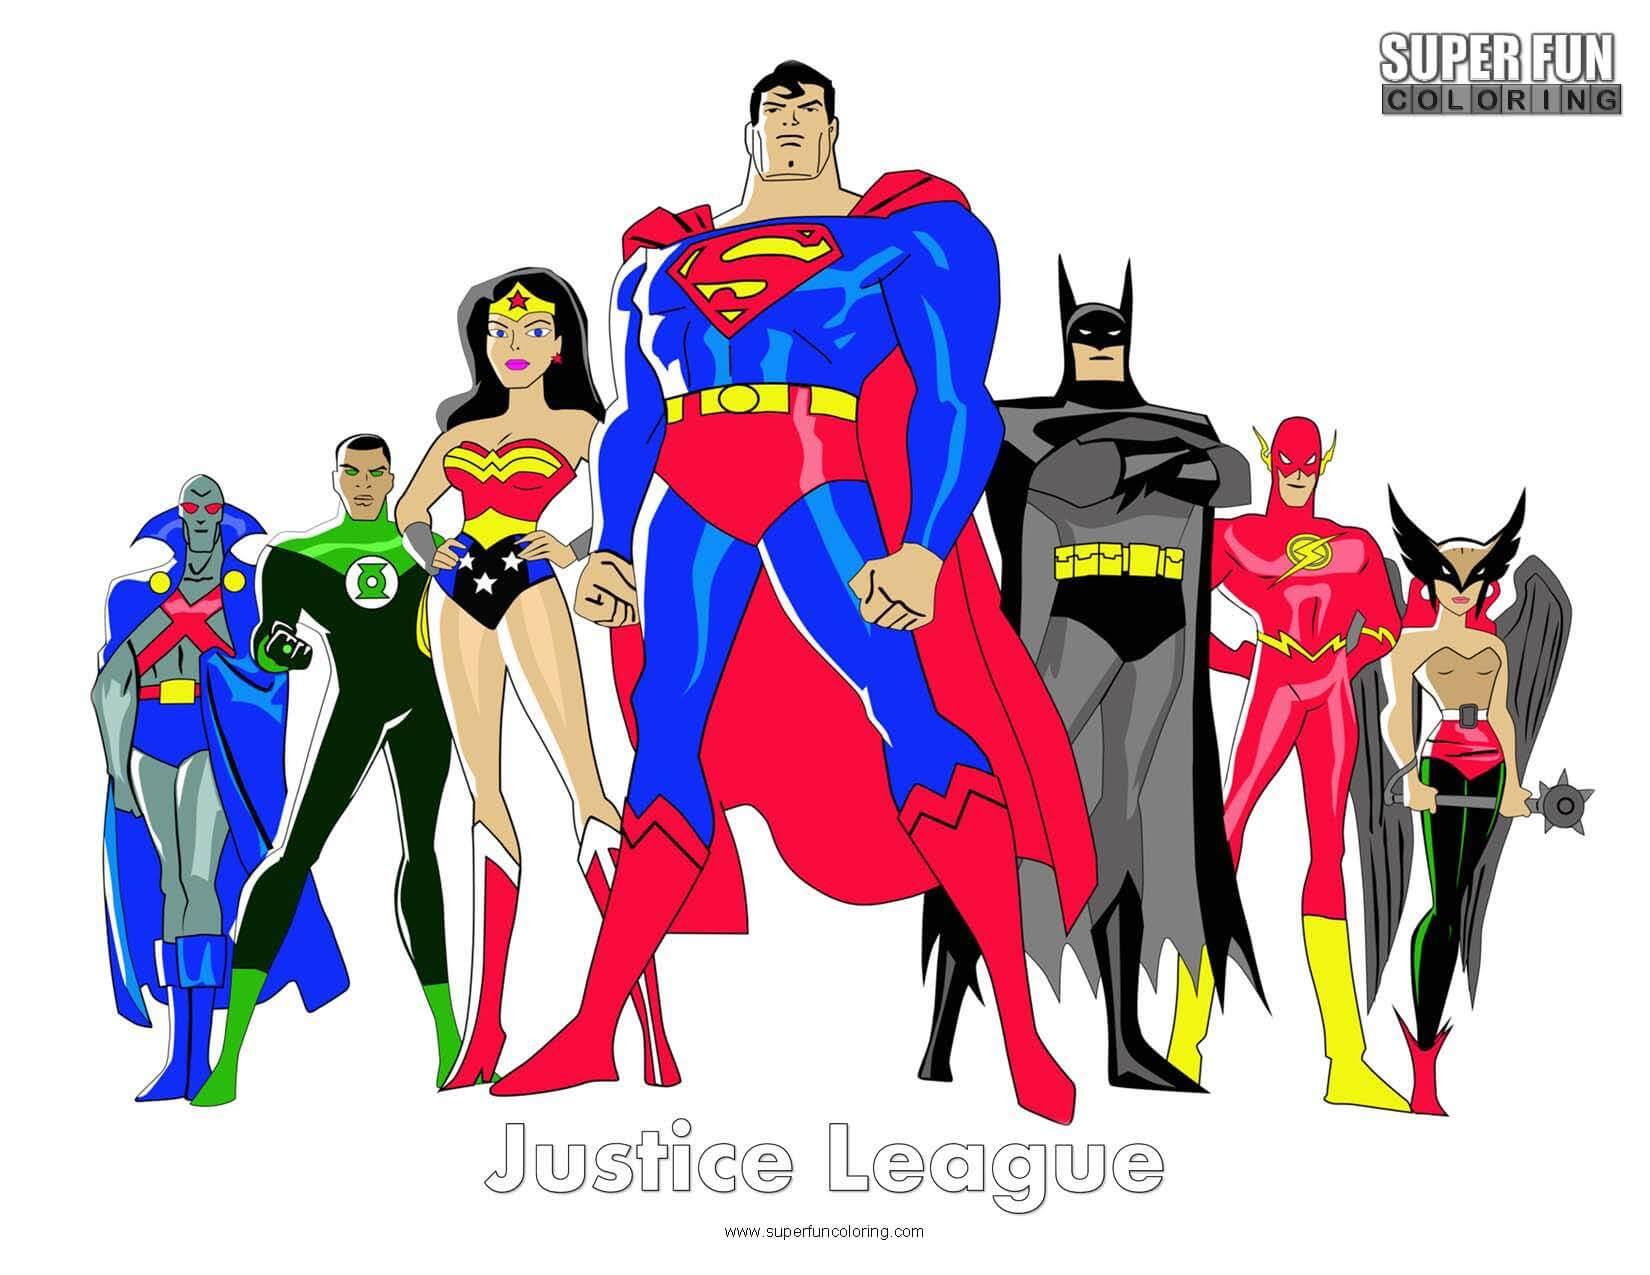 Justice League Coloring Page - Super Fun Coloring